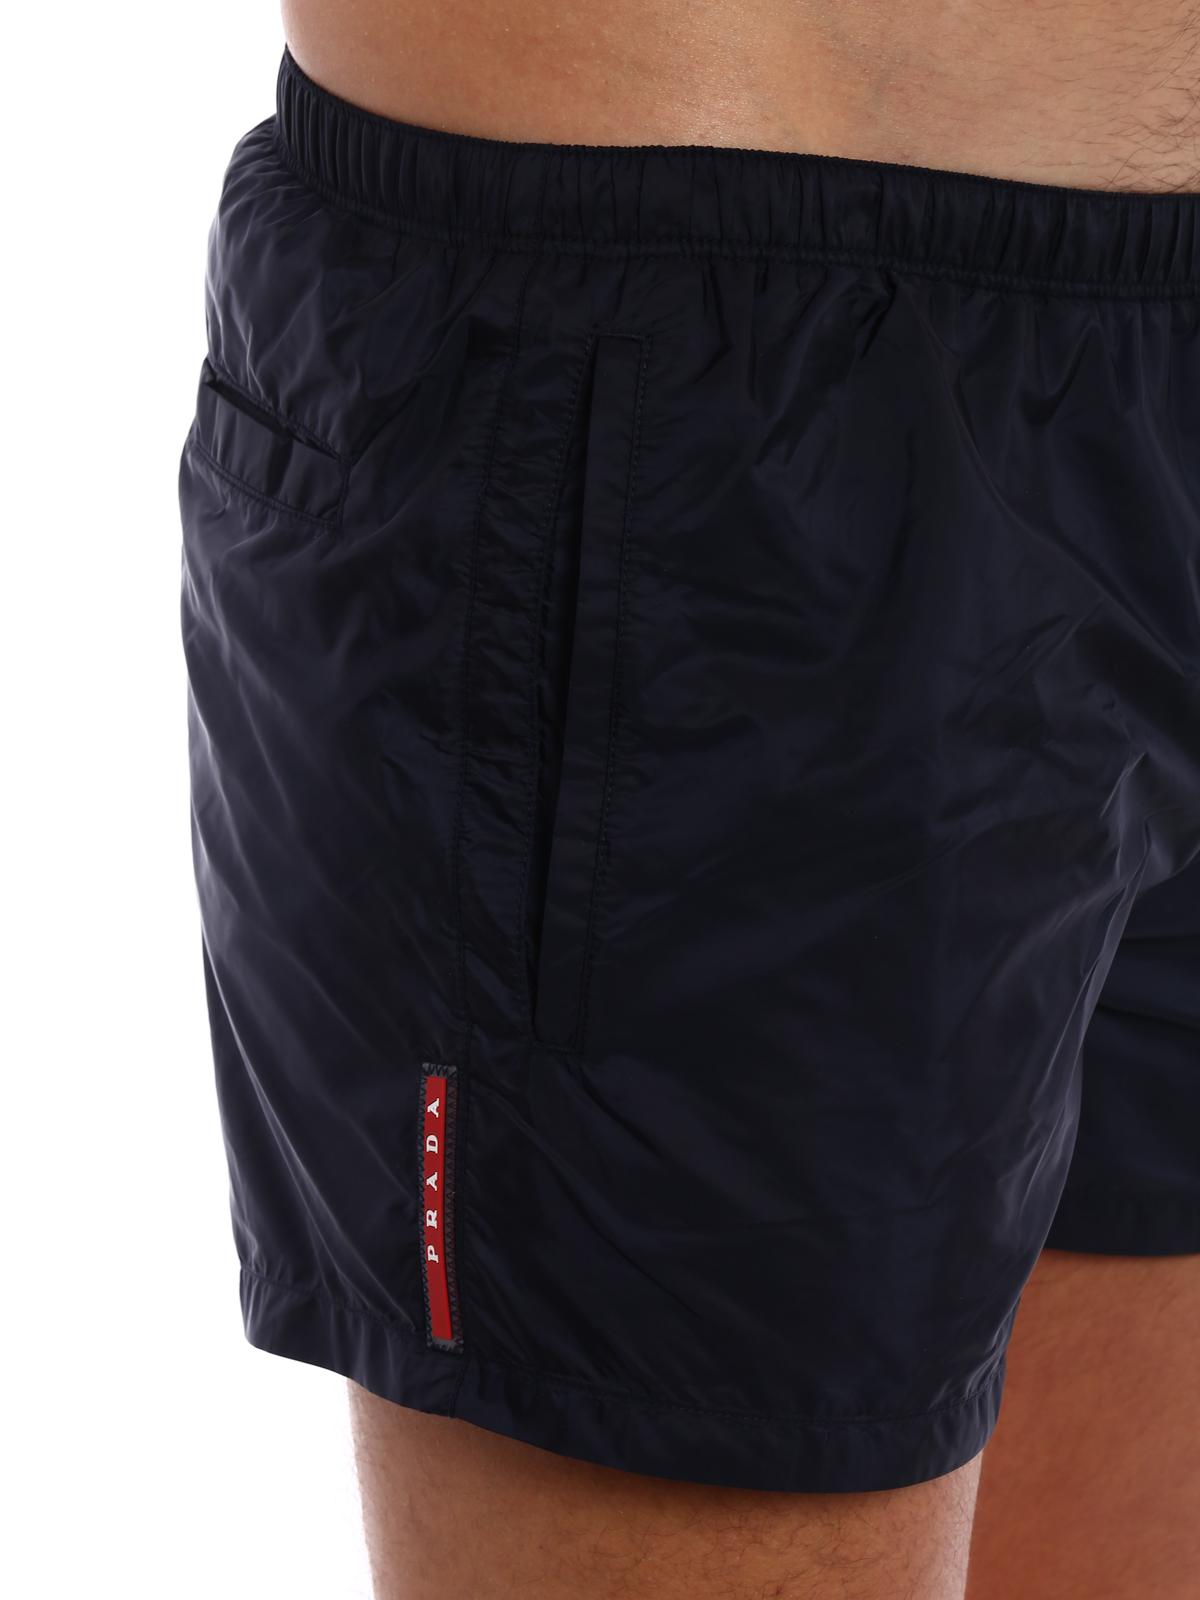 cdeb475273 Prada - Dark blue nylon swim shorts - Swim shorts & swimming trunks ...